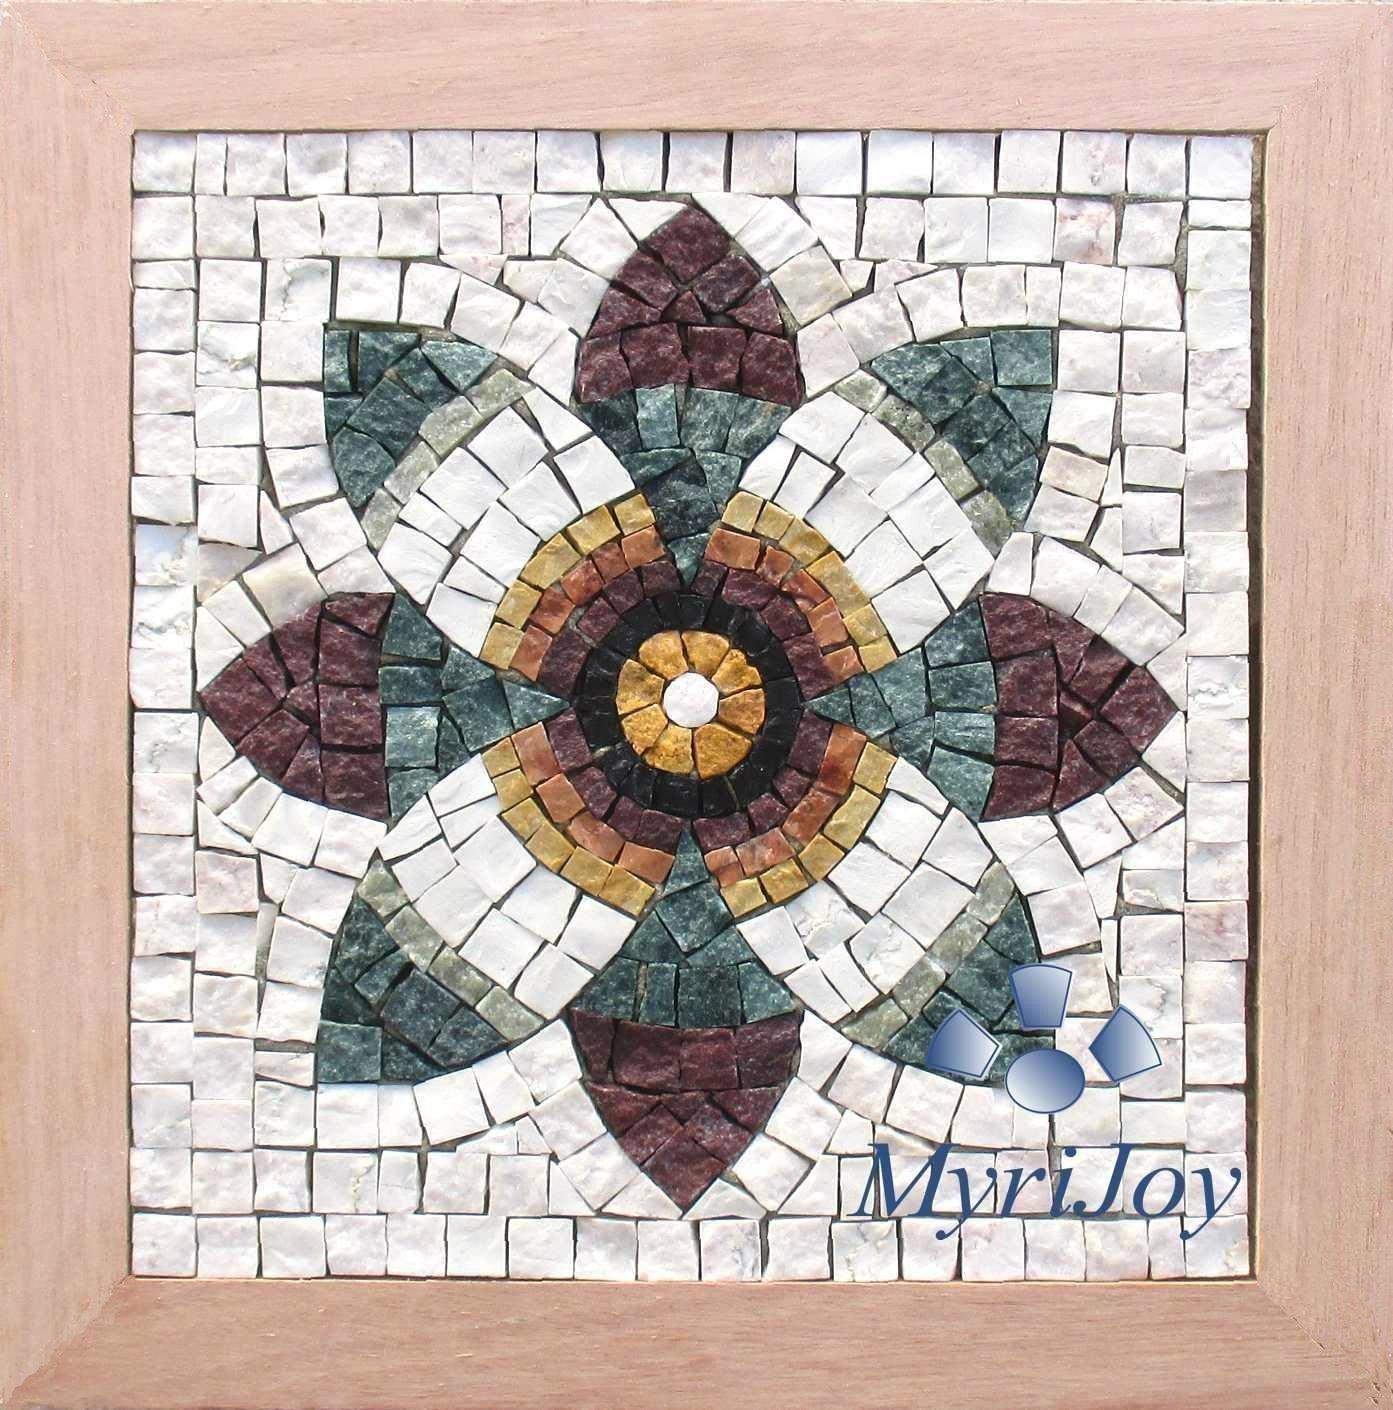 Mosaics Kit Diy Pomegranate Floweroriginal Gift Ideado It Yourself Giftfeng Shui Wall Artkitchen Wall Decor Fruitspomegranate Artpiece